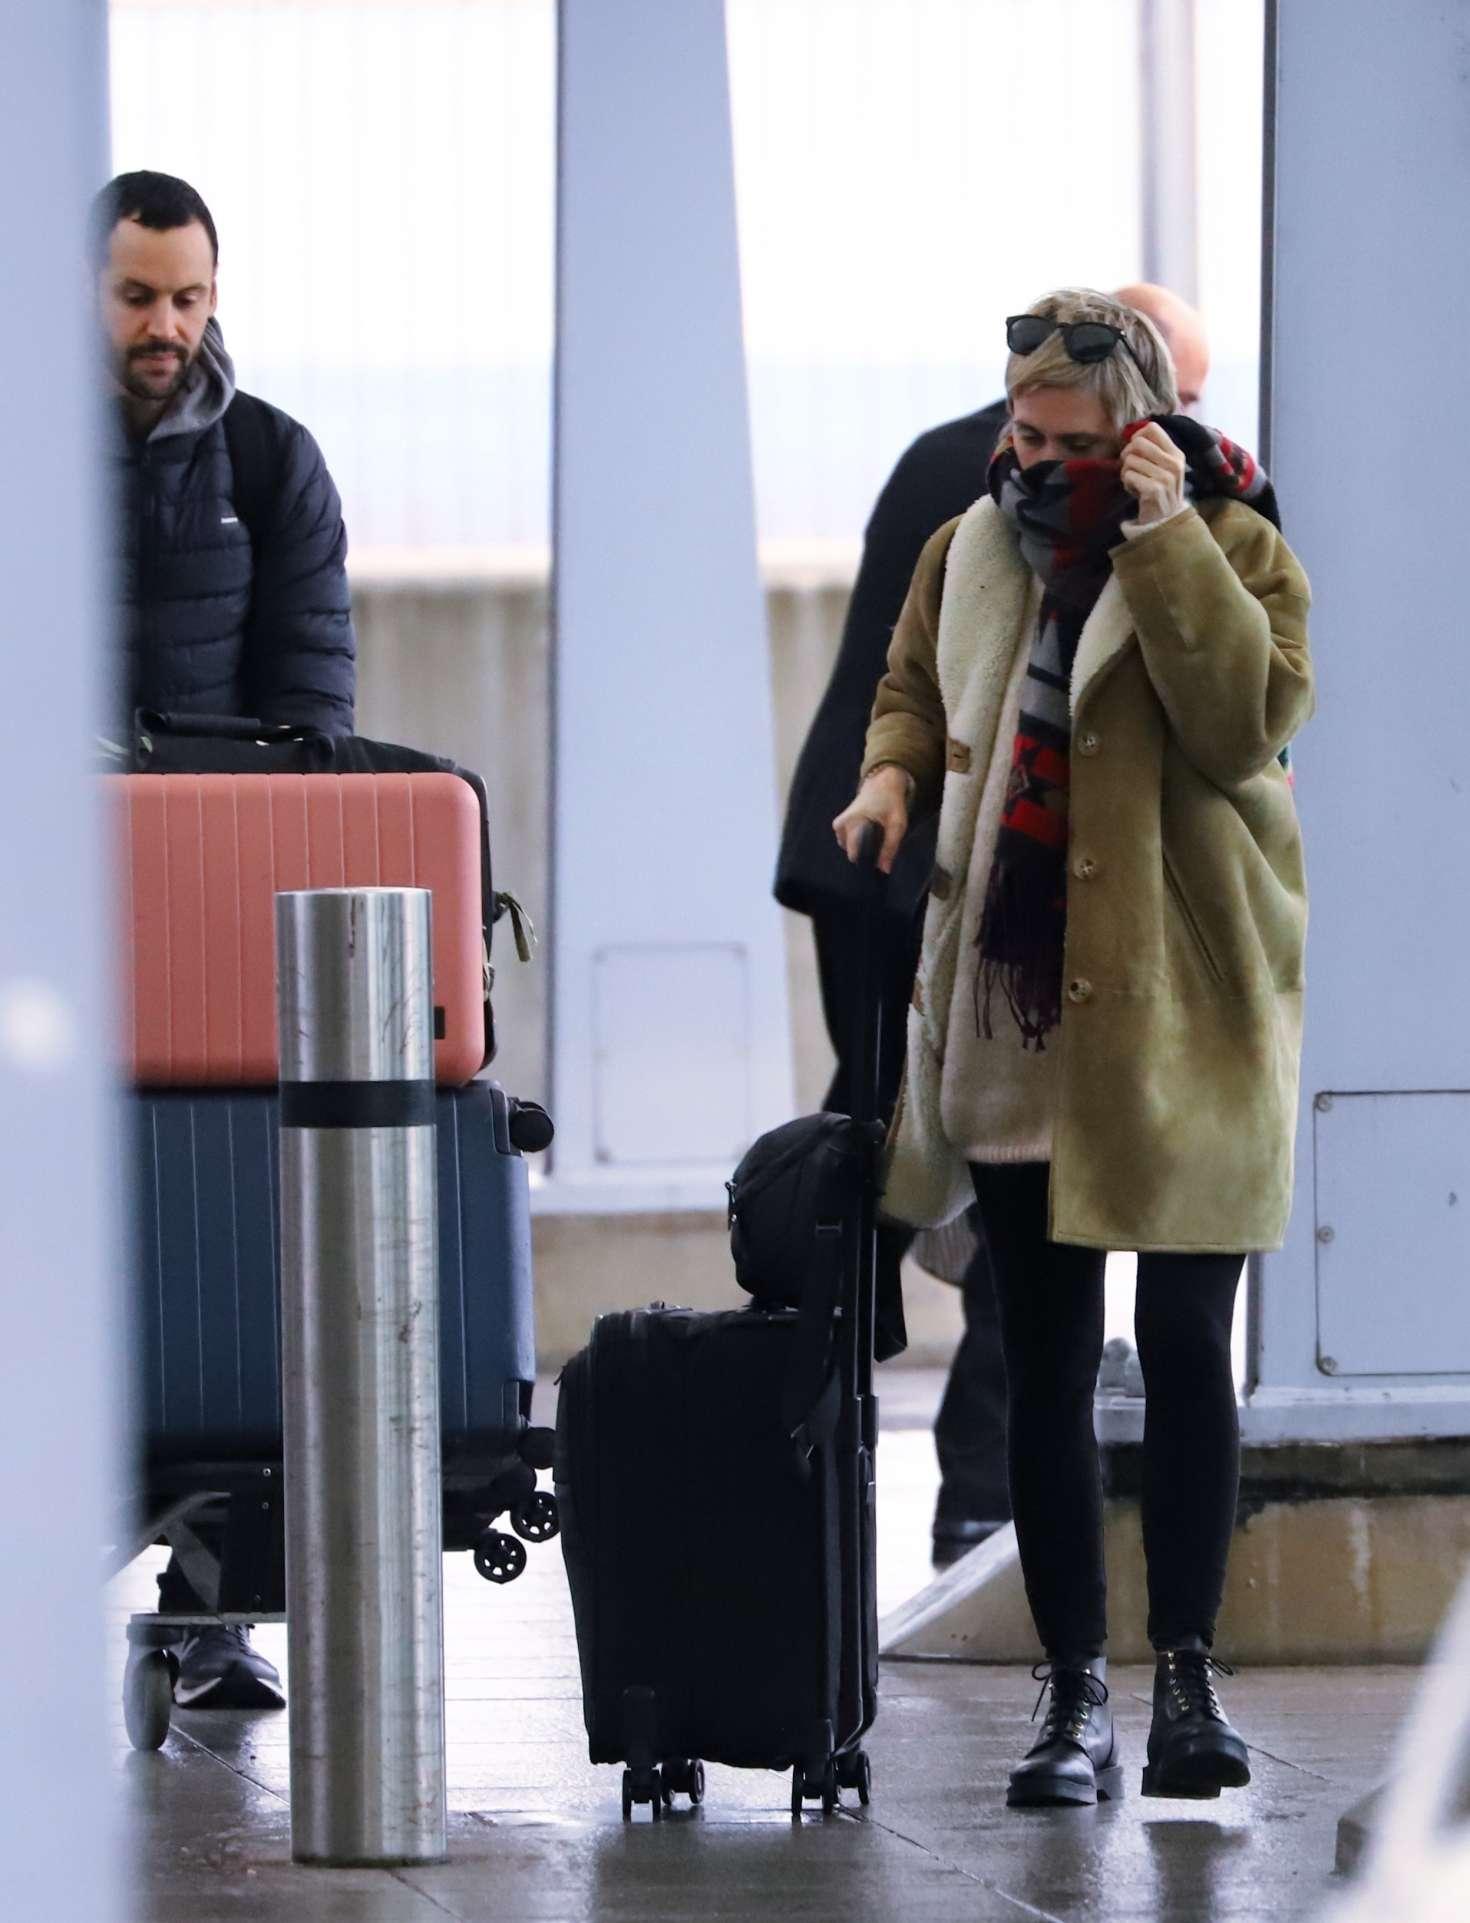 Cara Delevingne at Heathrow Airport in London